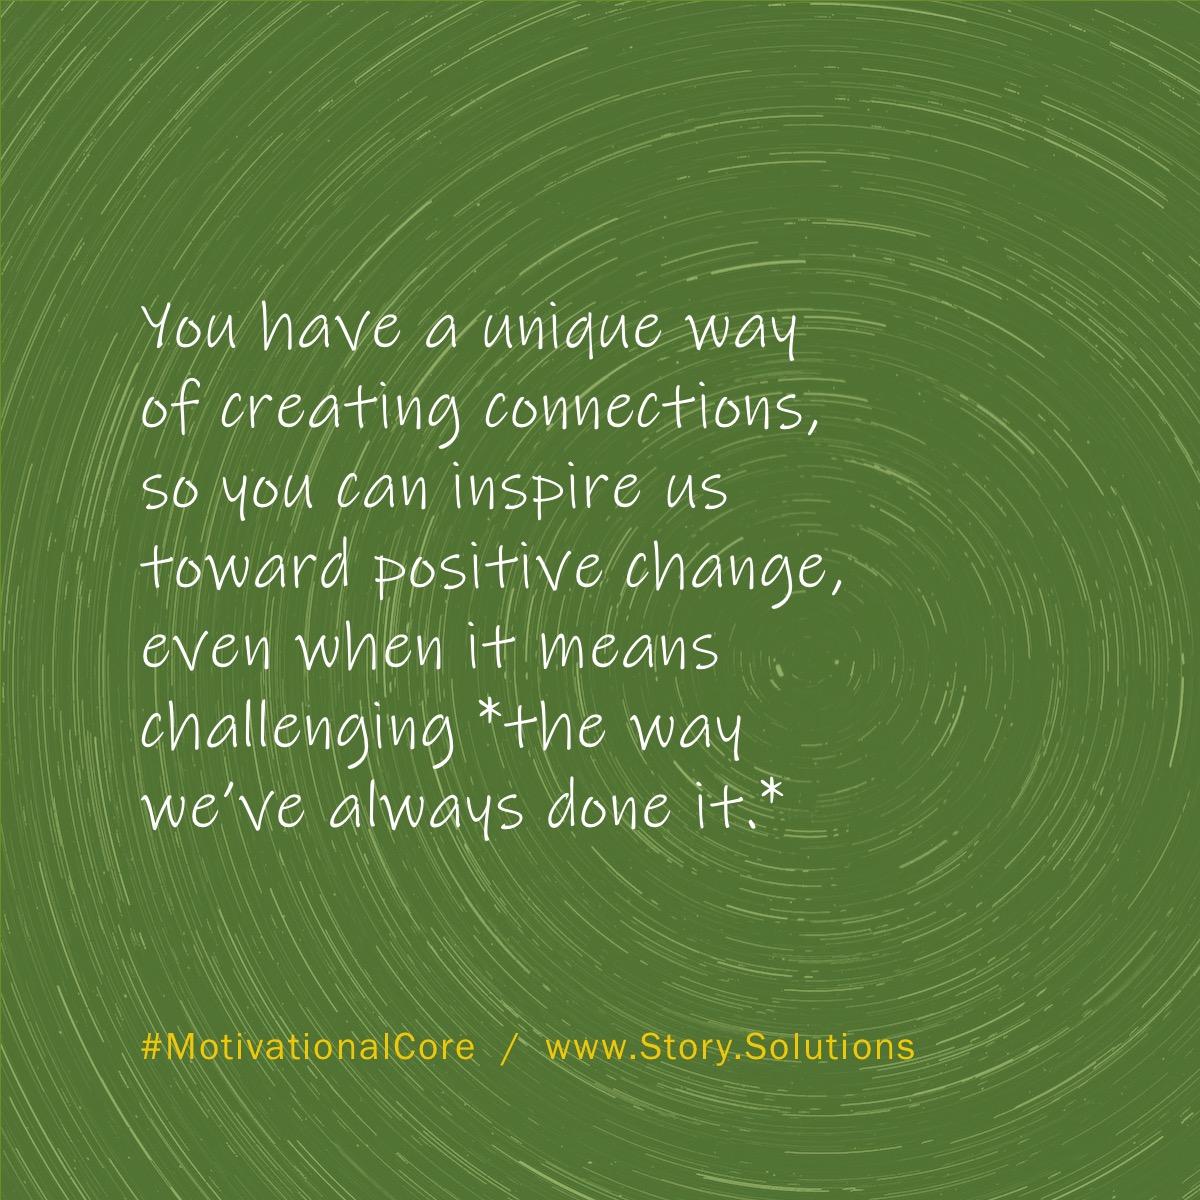 story-solutions-motivational-core-influence-behavior-2.jpeg